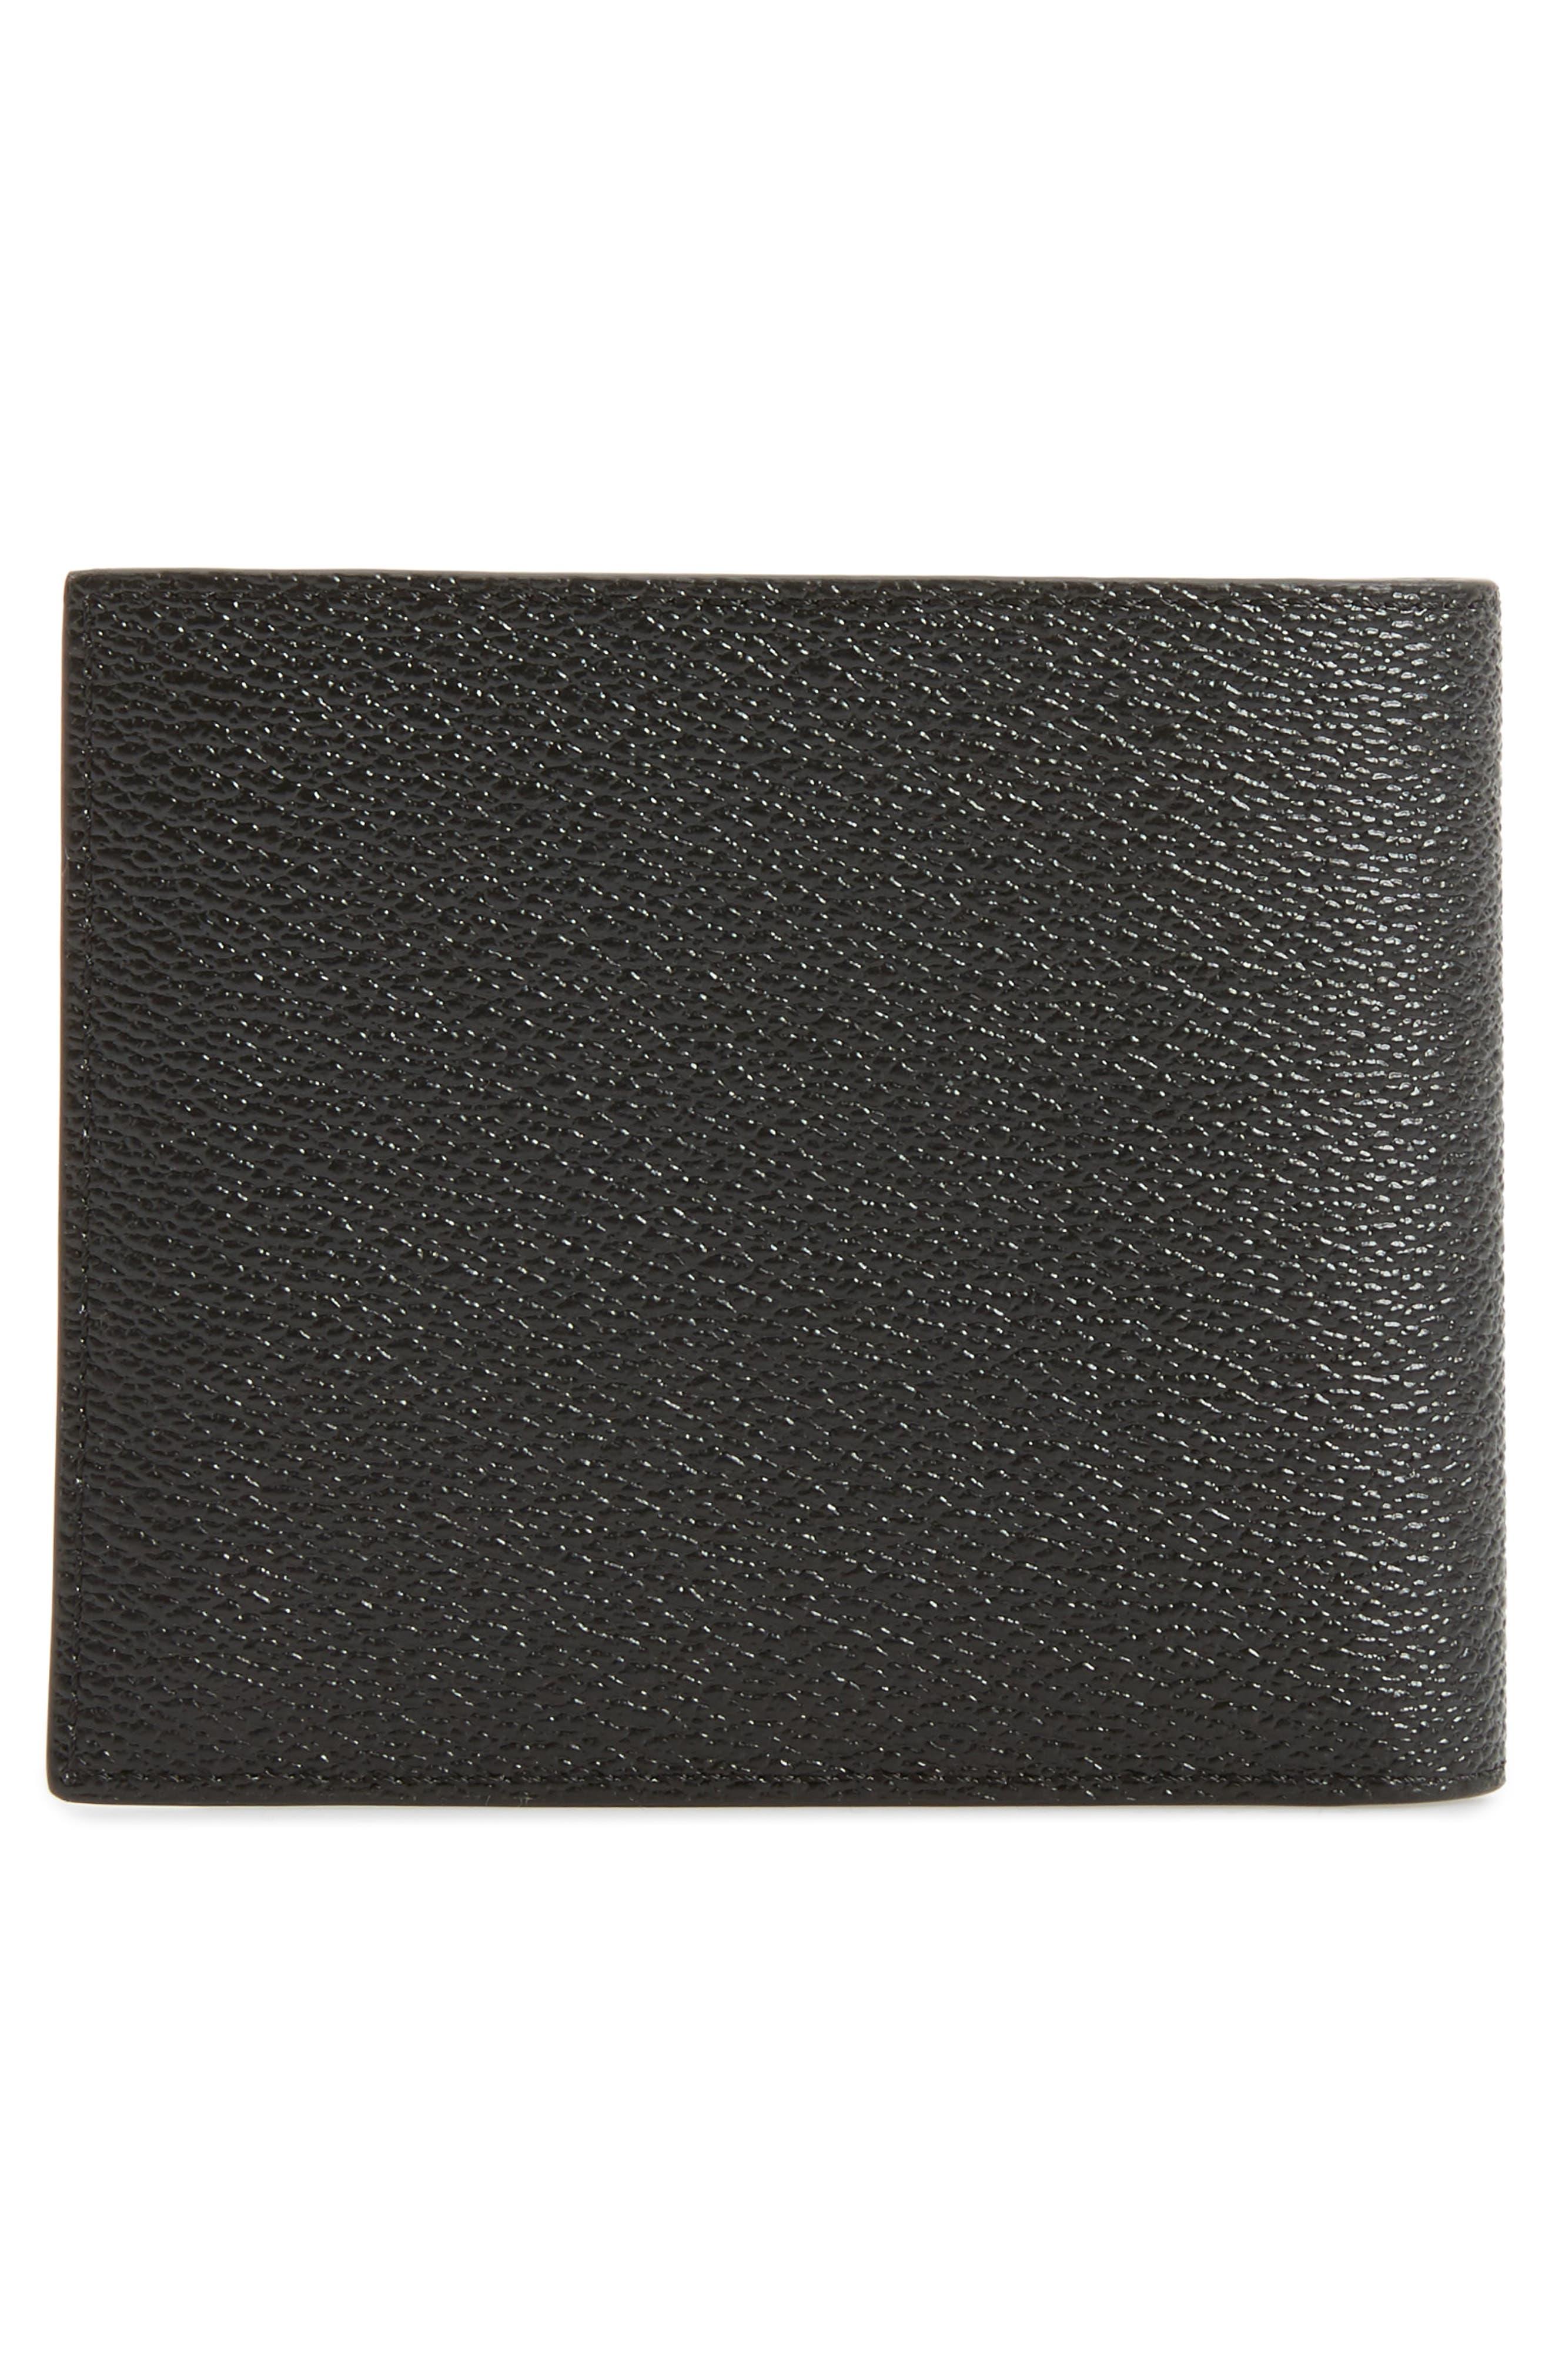 Shark Print Faux Leather Wallet,                             Alternate thumbnail 3, color,                             960